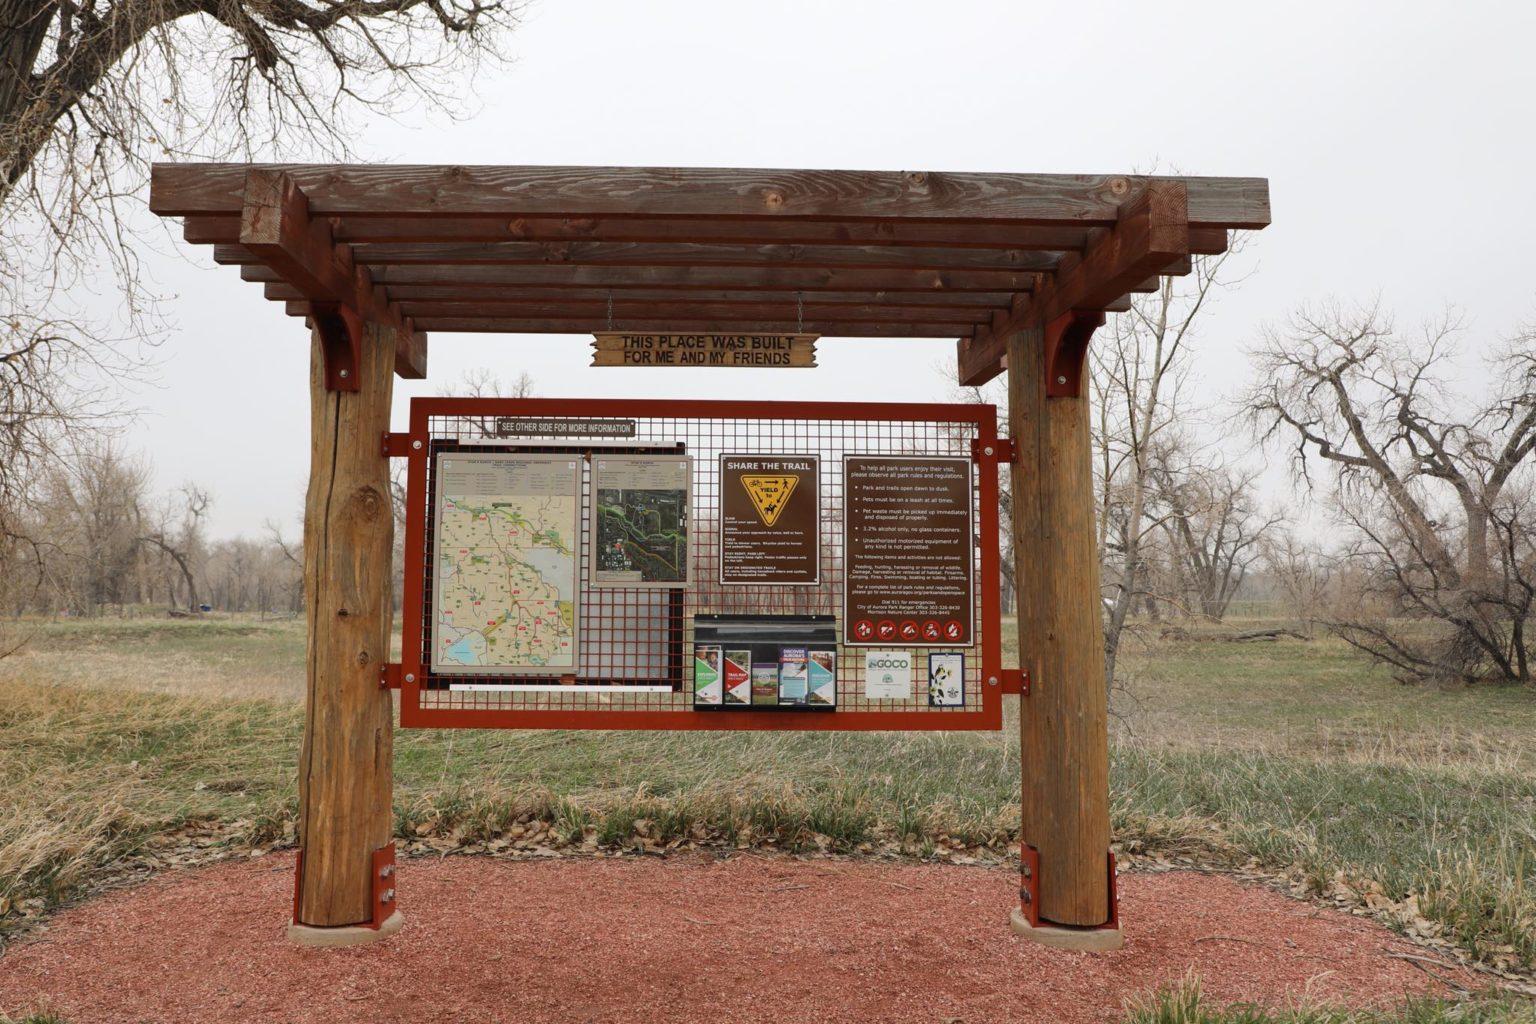 Morrison Nature Center At Star K Ranch Trail Sign